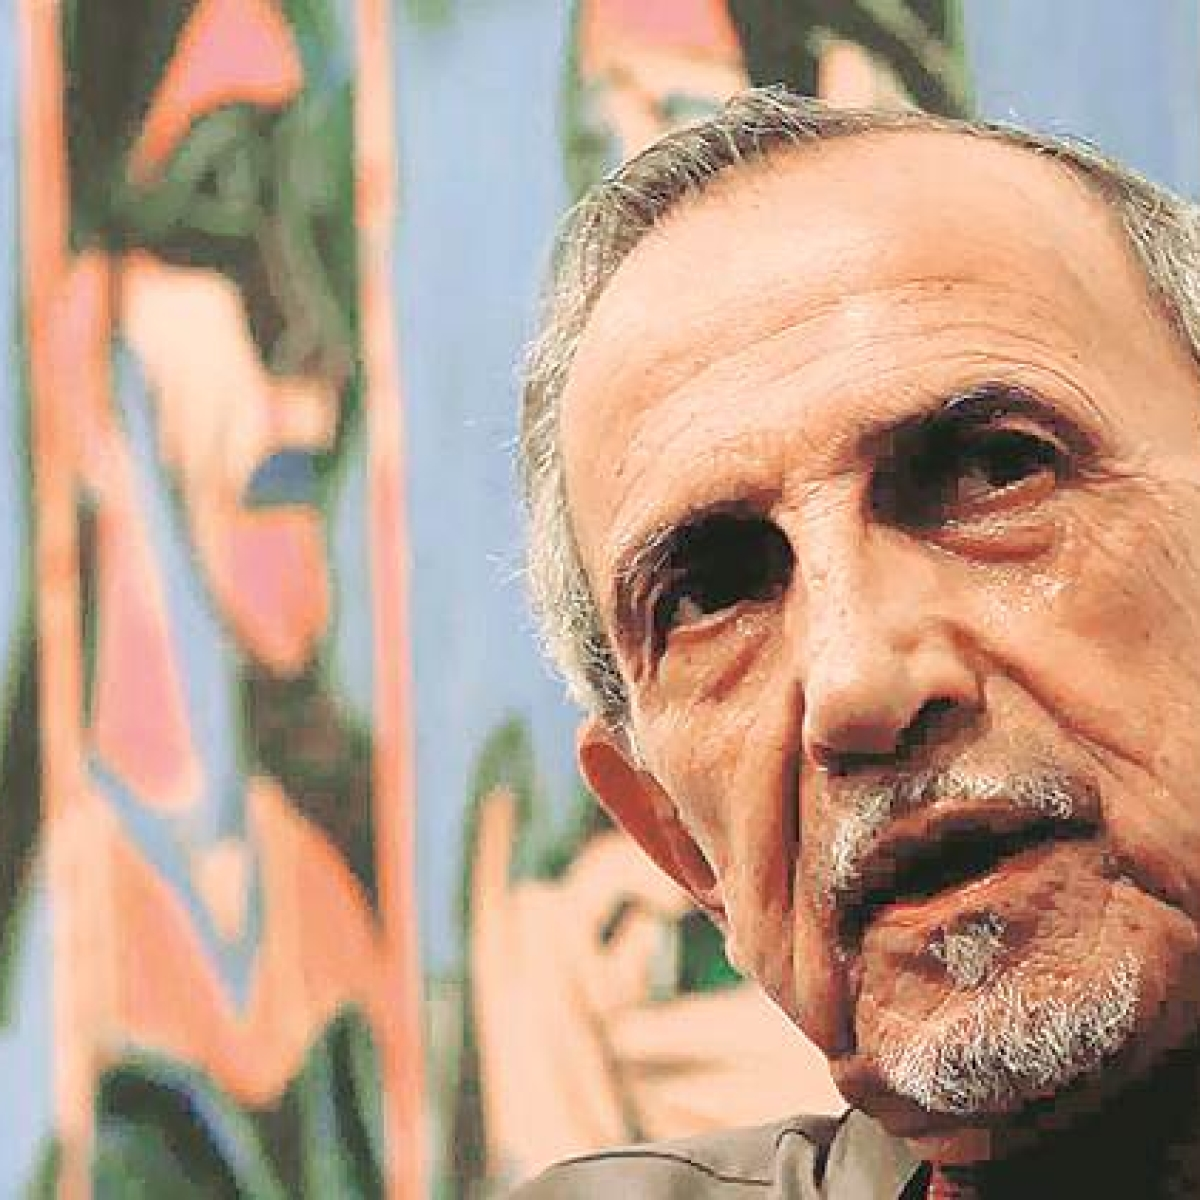 Nawazuddin Siddiqui, Kamal Haasan and others from the world of cinema mourn demise of theatre doyen Ebrahim Alkazi